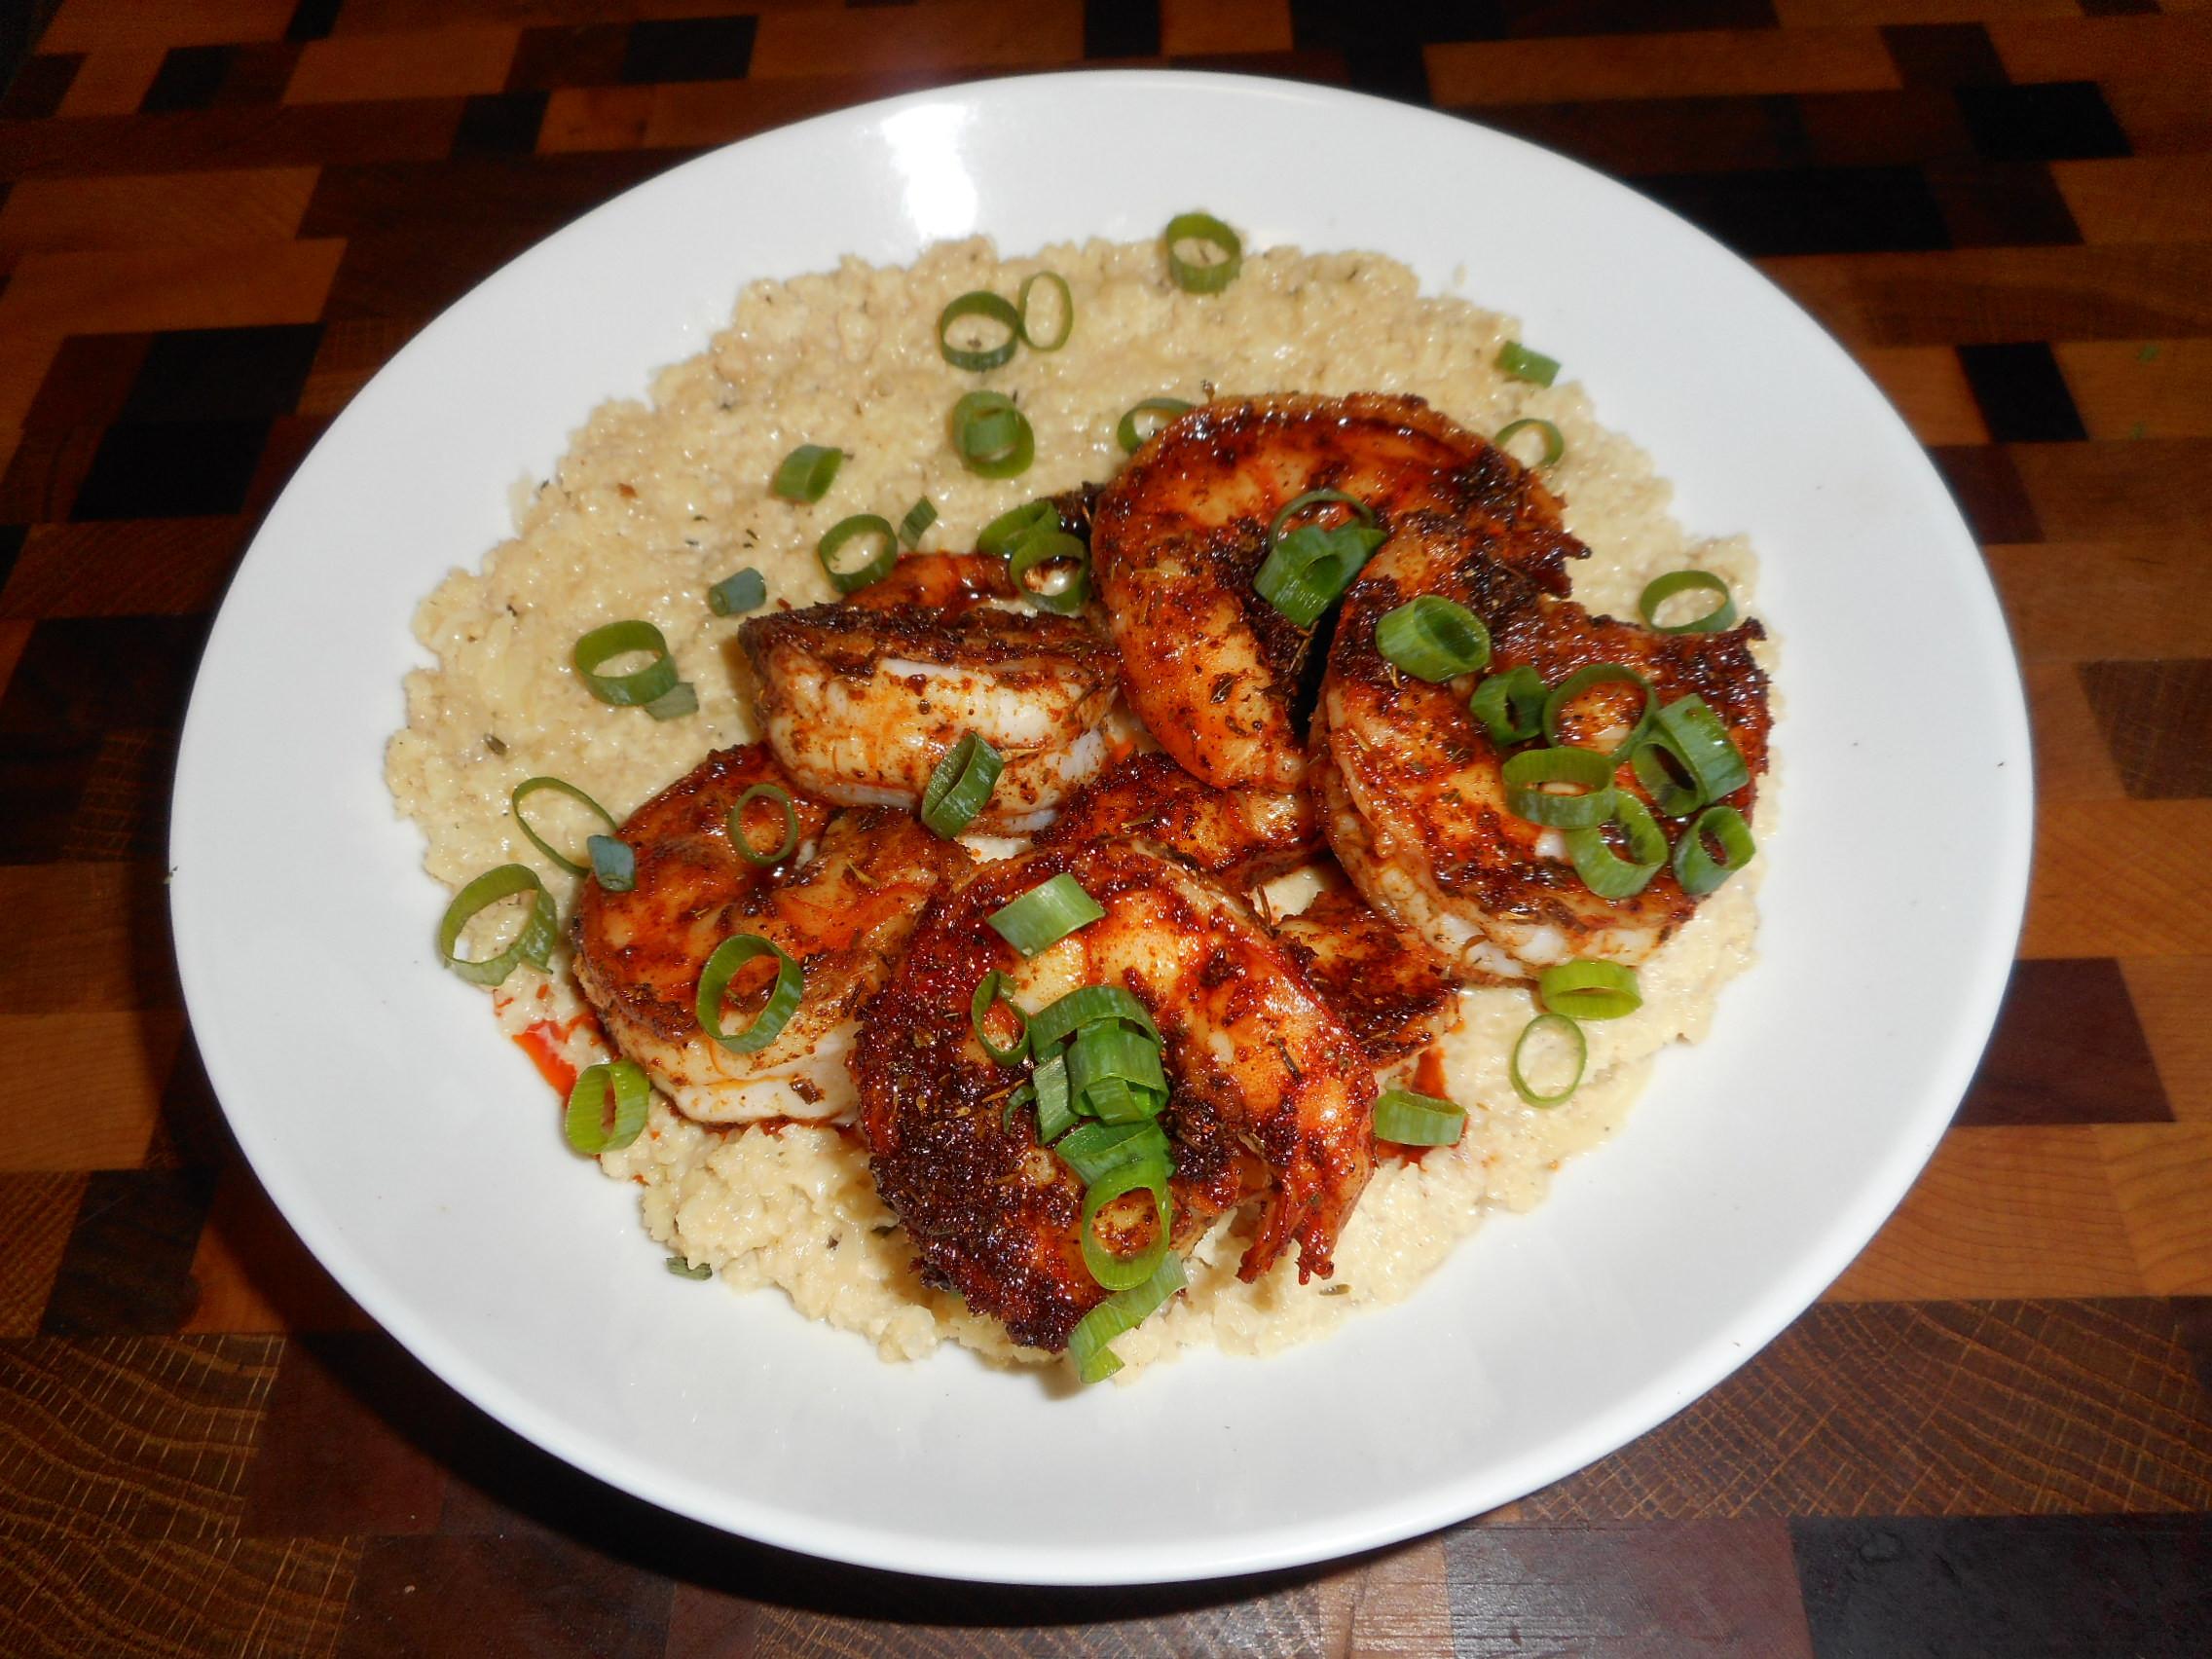 Cajun Shrimp Keto  Keto Cajun Shrimp & Grits LowCarb Diabetic Chef s Recipe